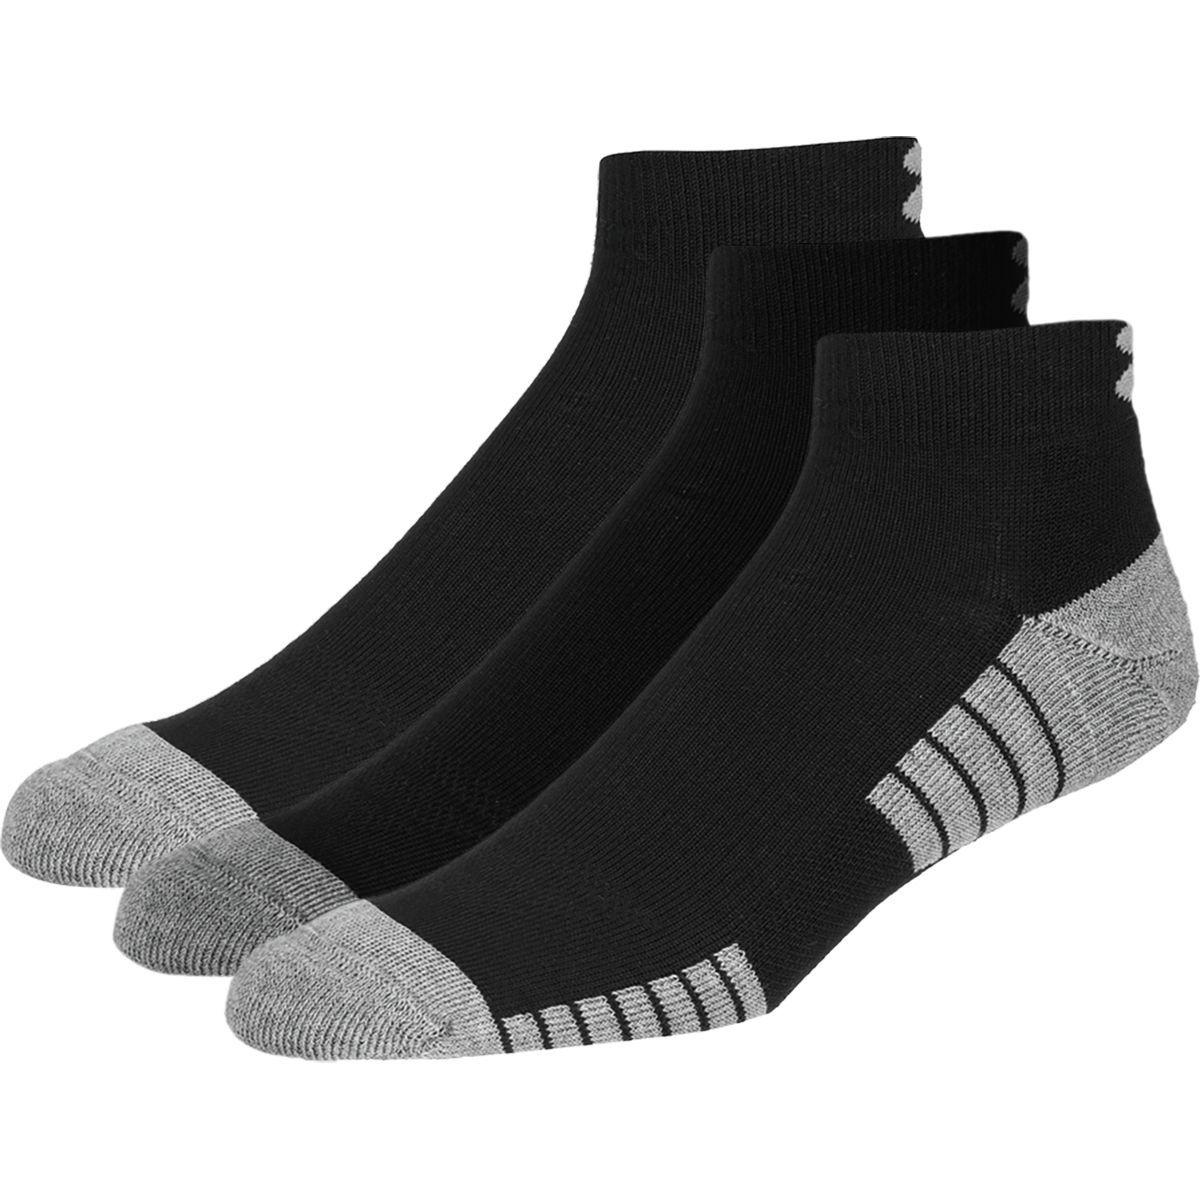 Under Armour HeatGear Tech Lo Cut Sock - Men's